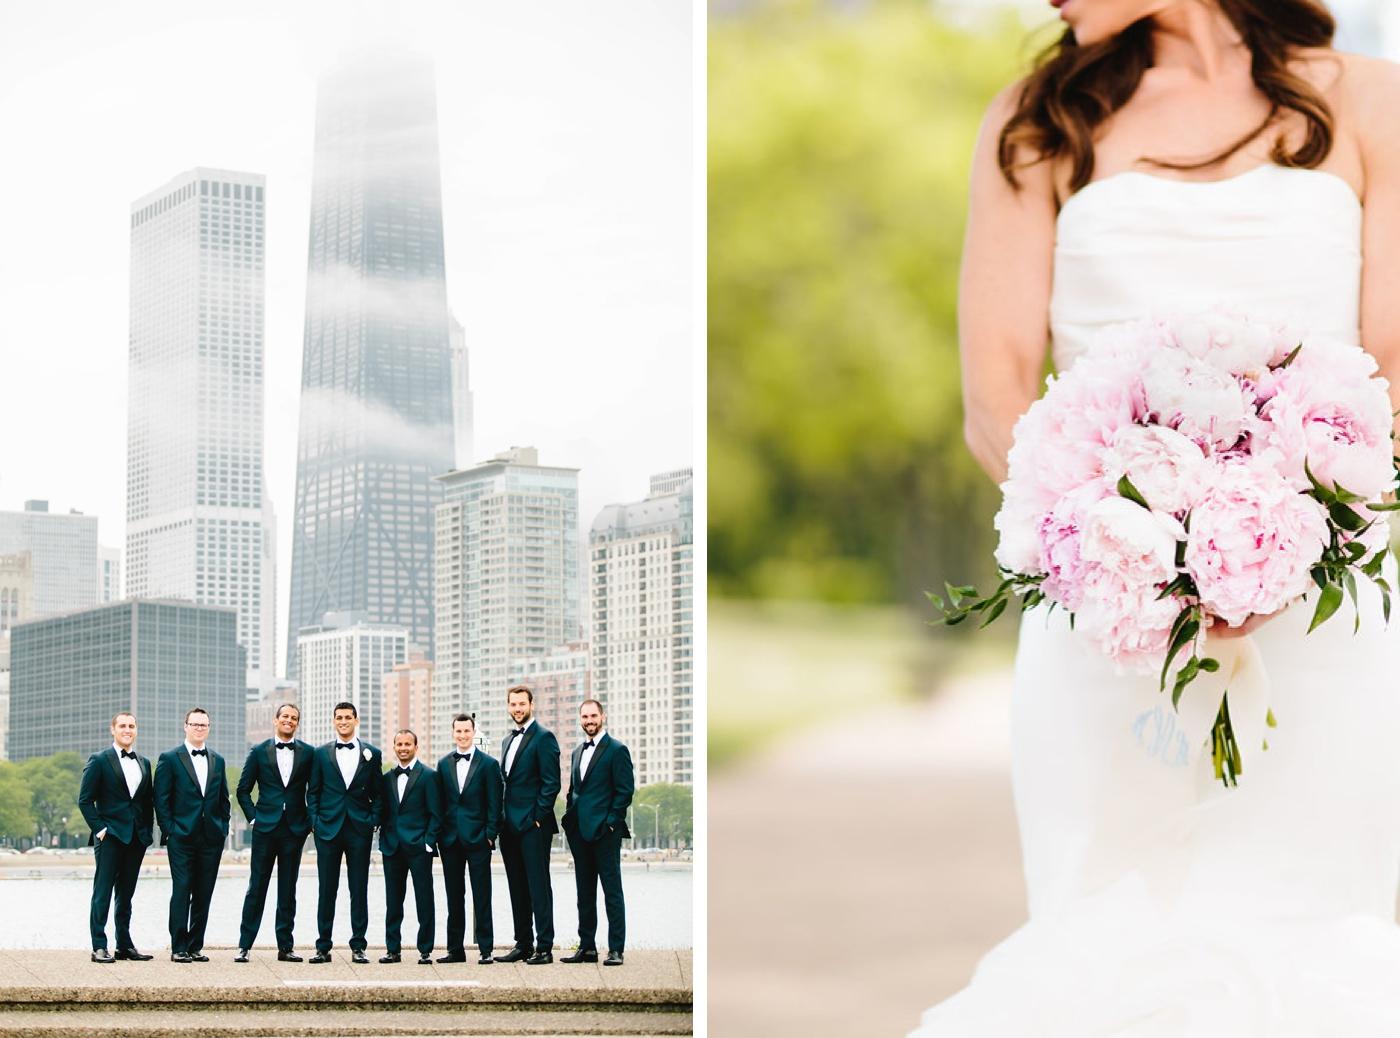 chicago-fine-art-wedding-photography-sakamuri33